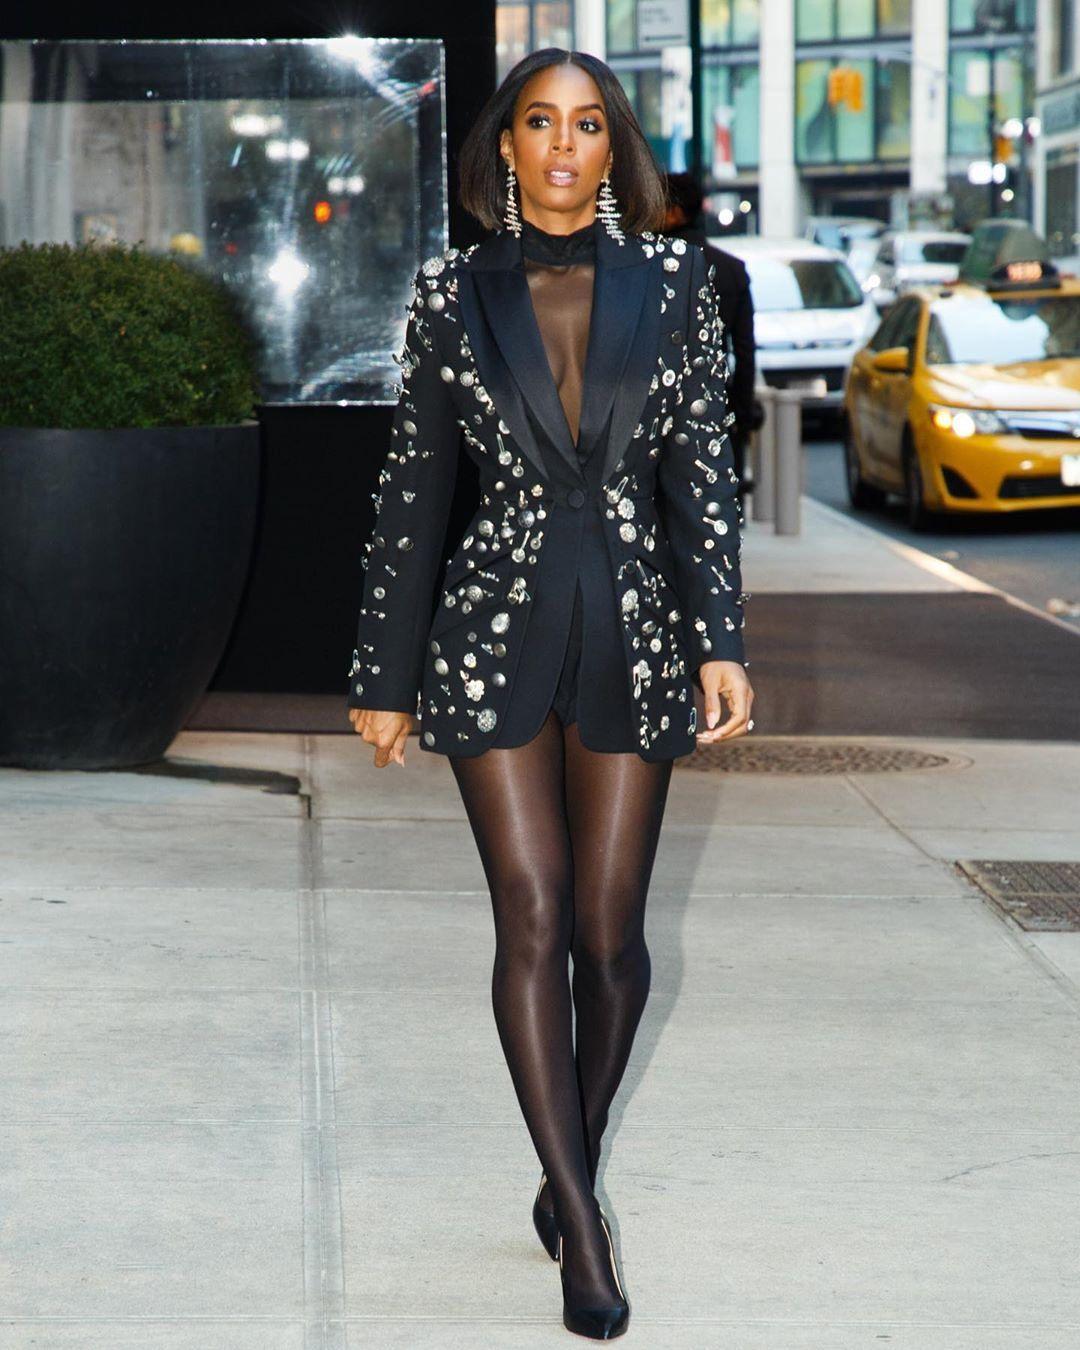 KELENDRIA ROWLAND on Kelly rowland style, Fashion